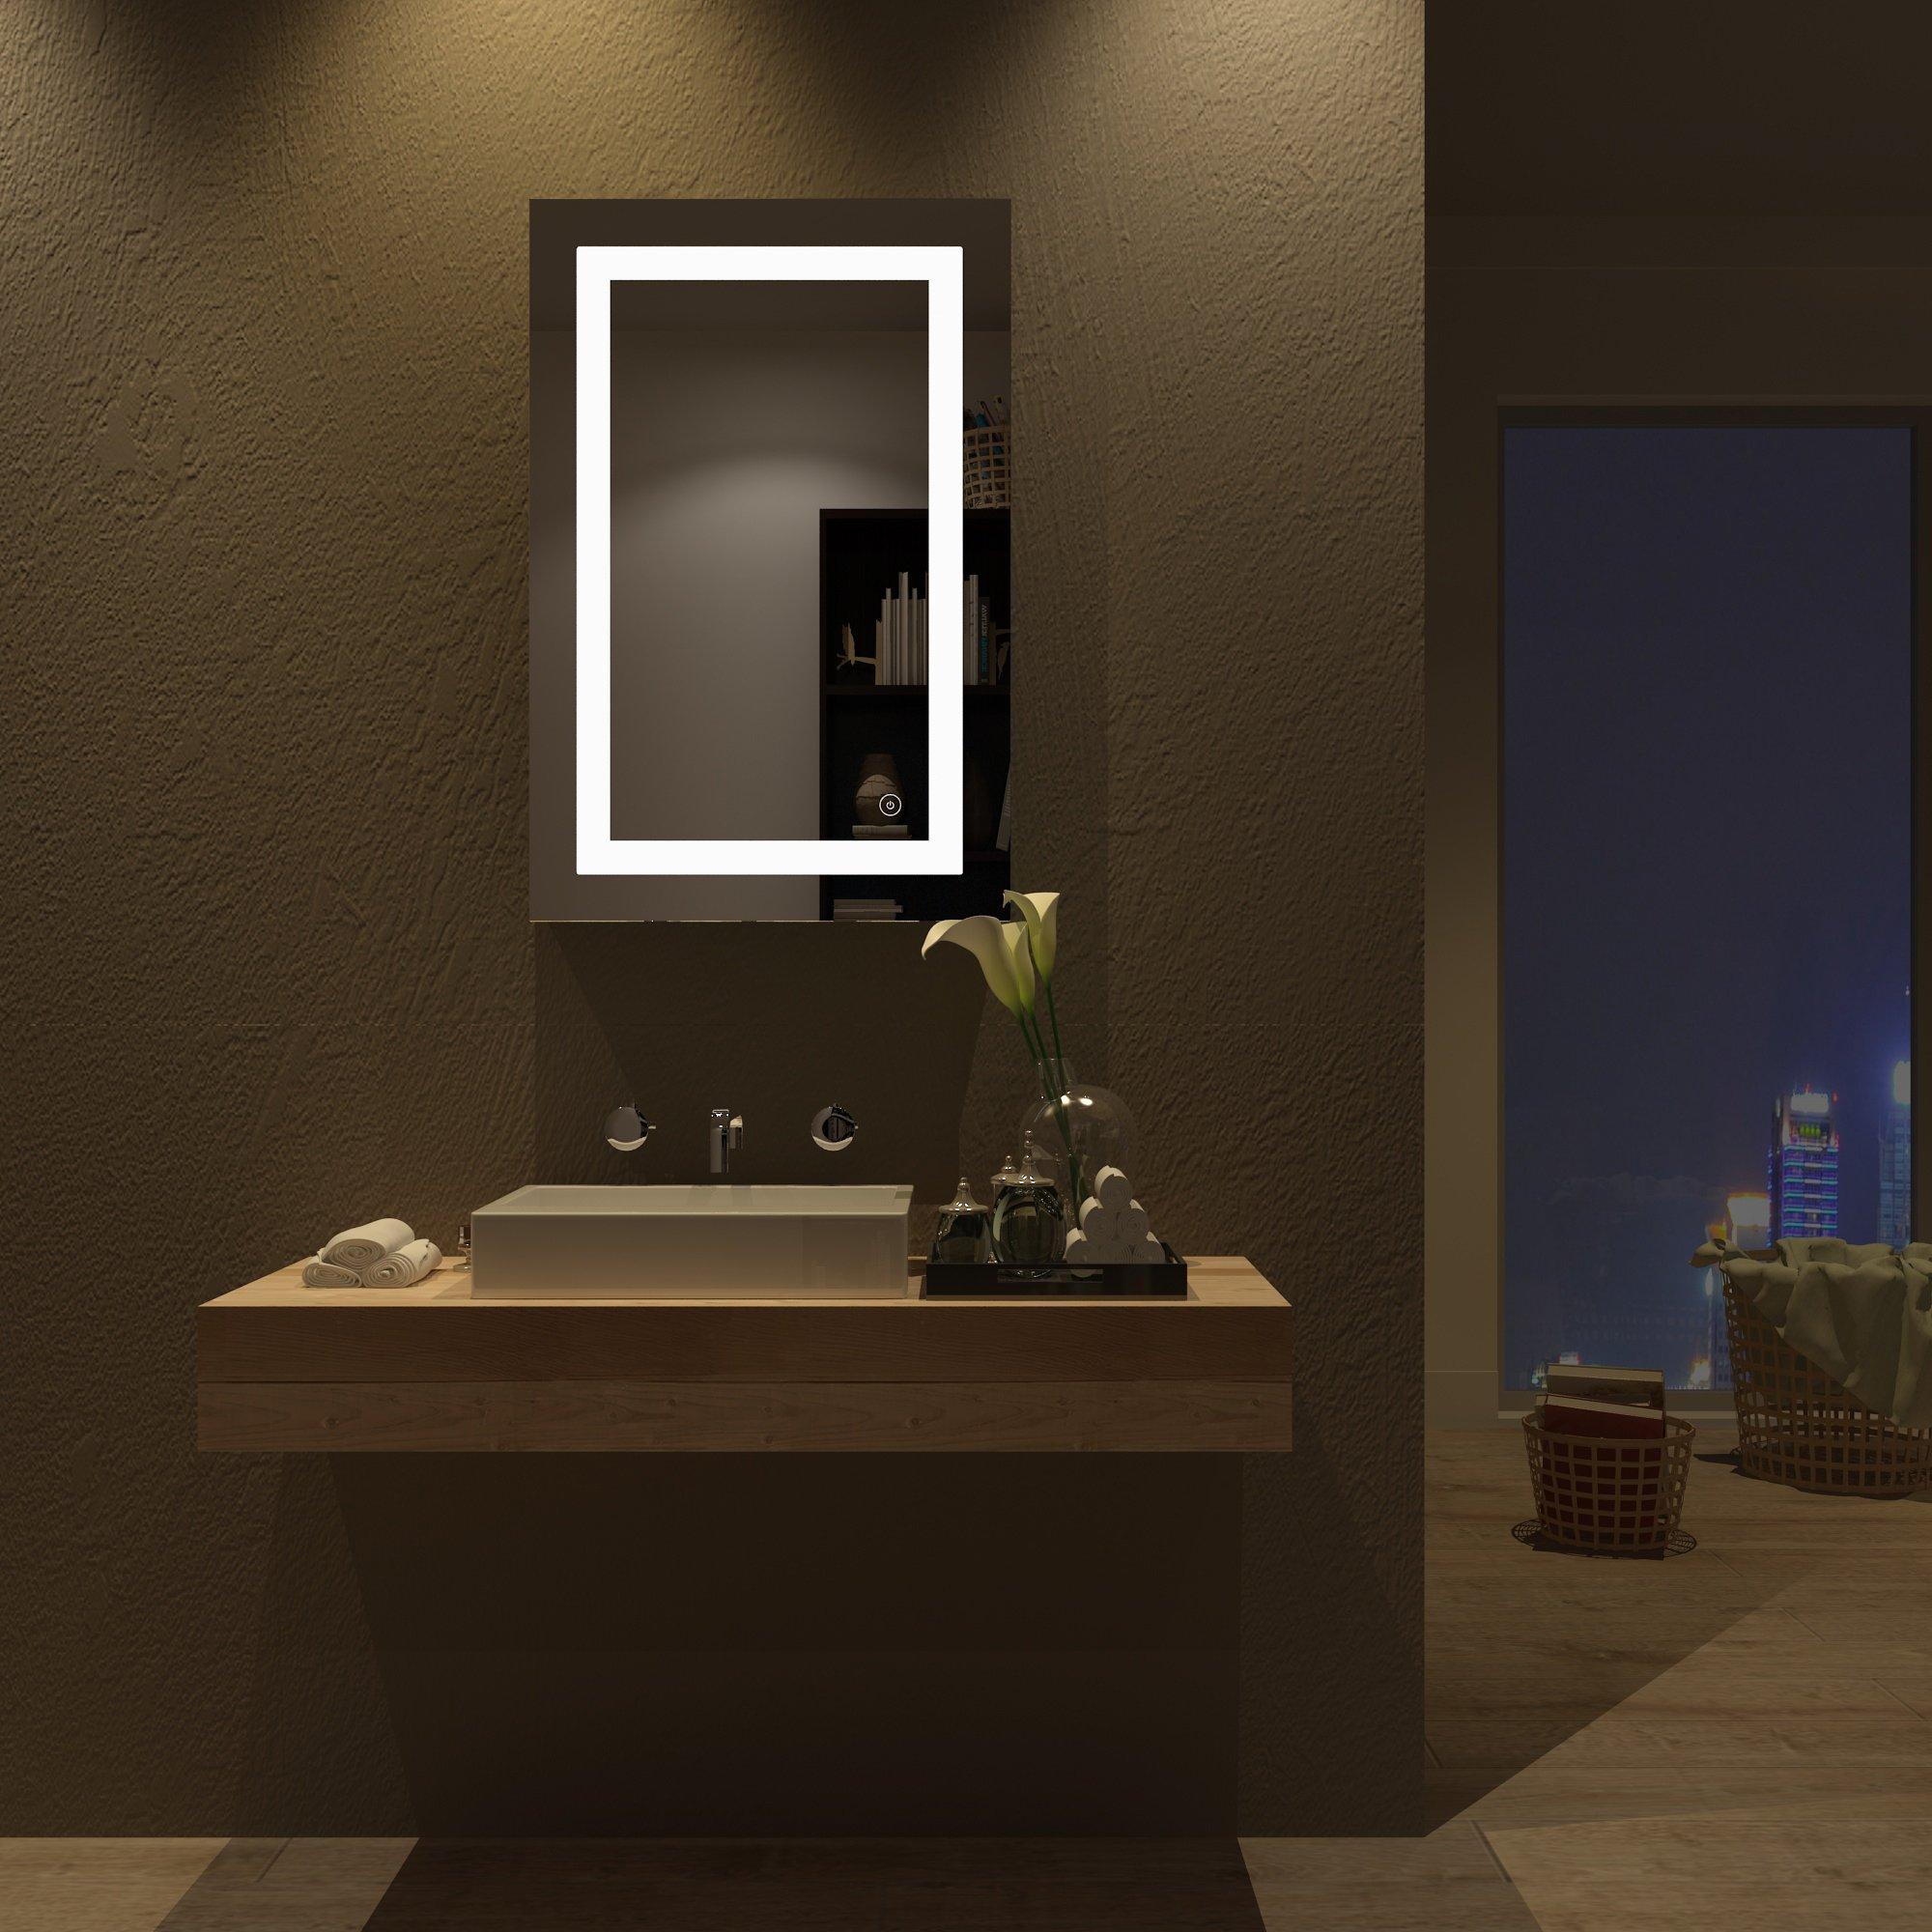 home sceva led lighted mirrors vanity bathroom frameless backlit wall mirror 756832435168 ebay. Black Bedroom Furniture Sets. Home Design Ideas